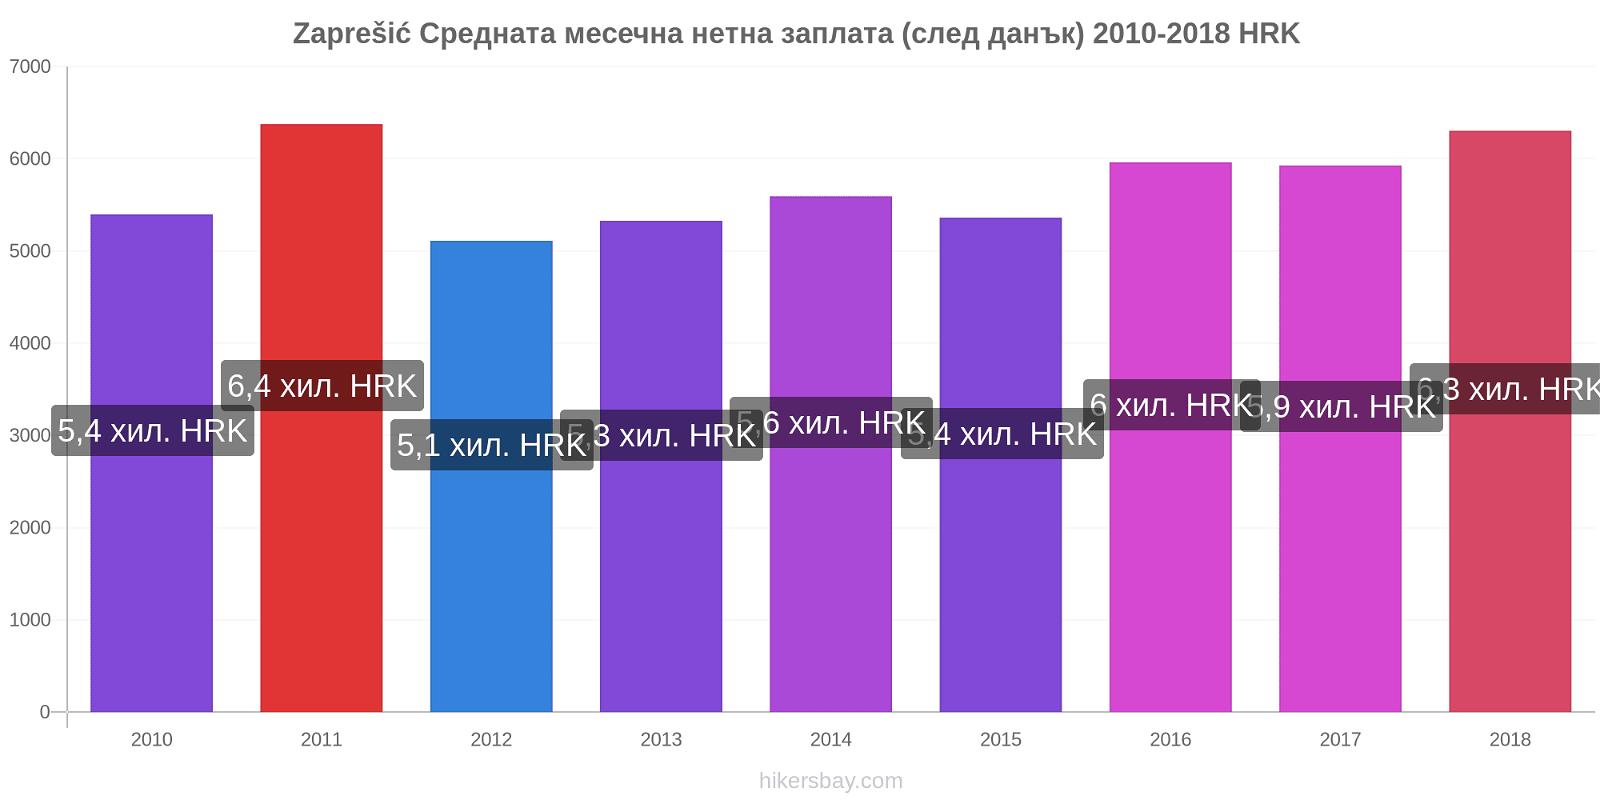 Zaprešić ценови промени Средната месечна нетна заплата (след данък) hikersbay.com